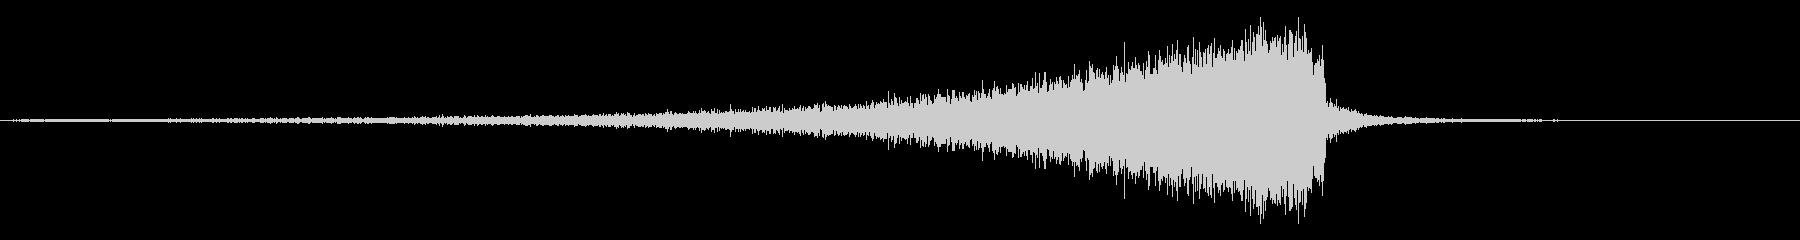 TV RADIO SFX6 ノイズ効果の未再生の波形